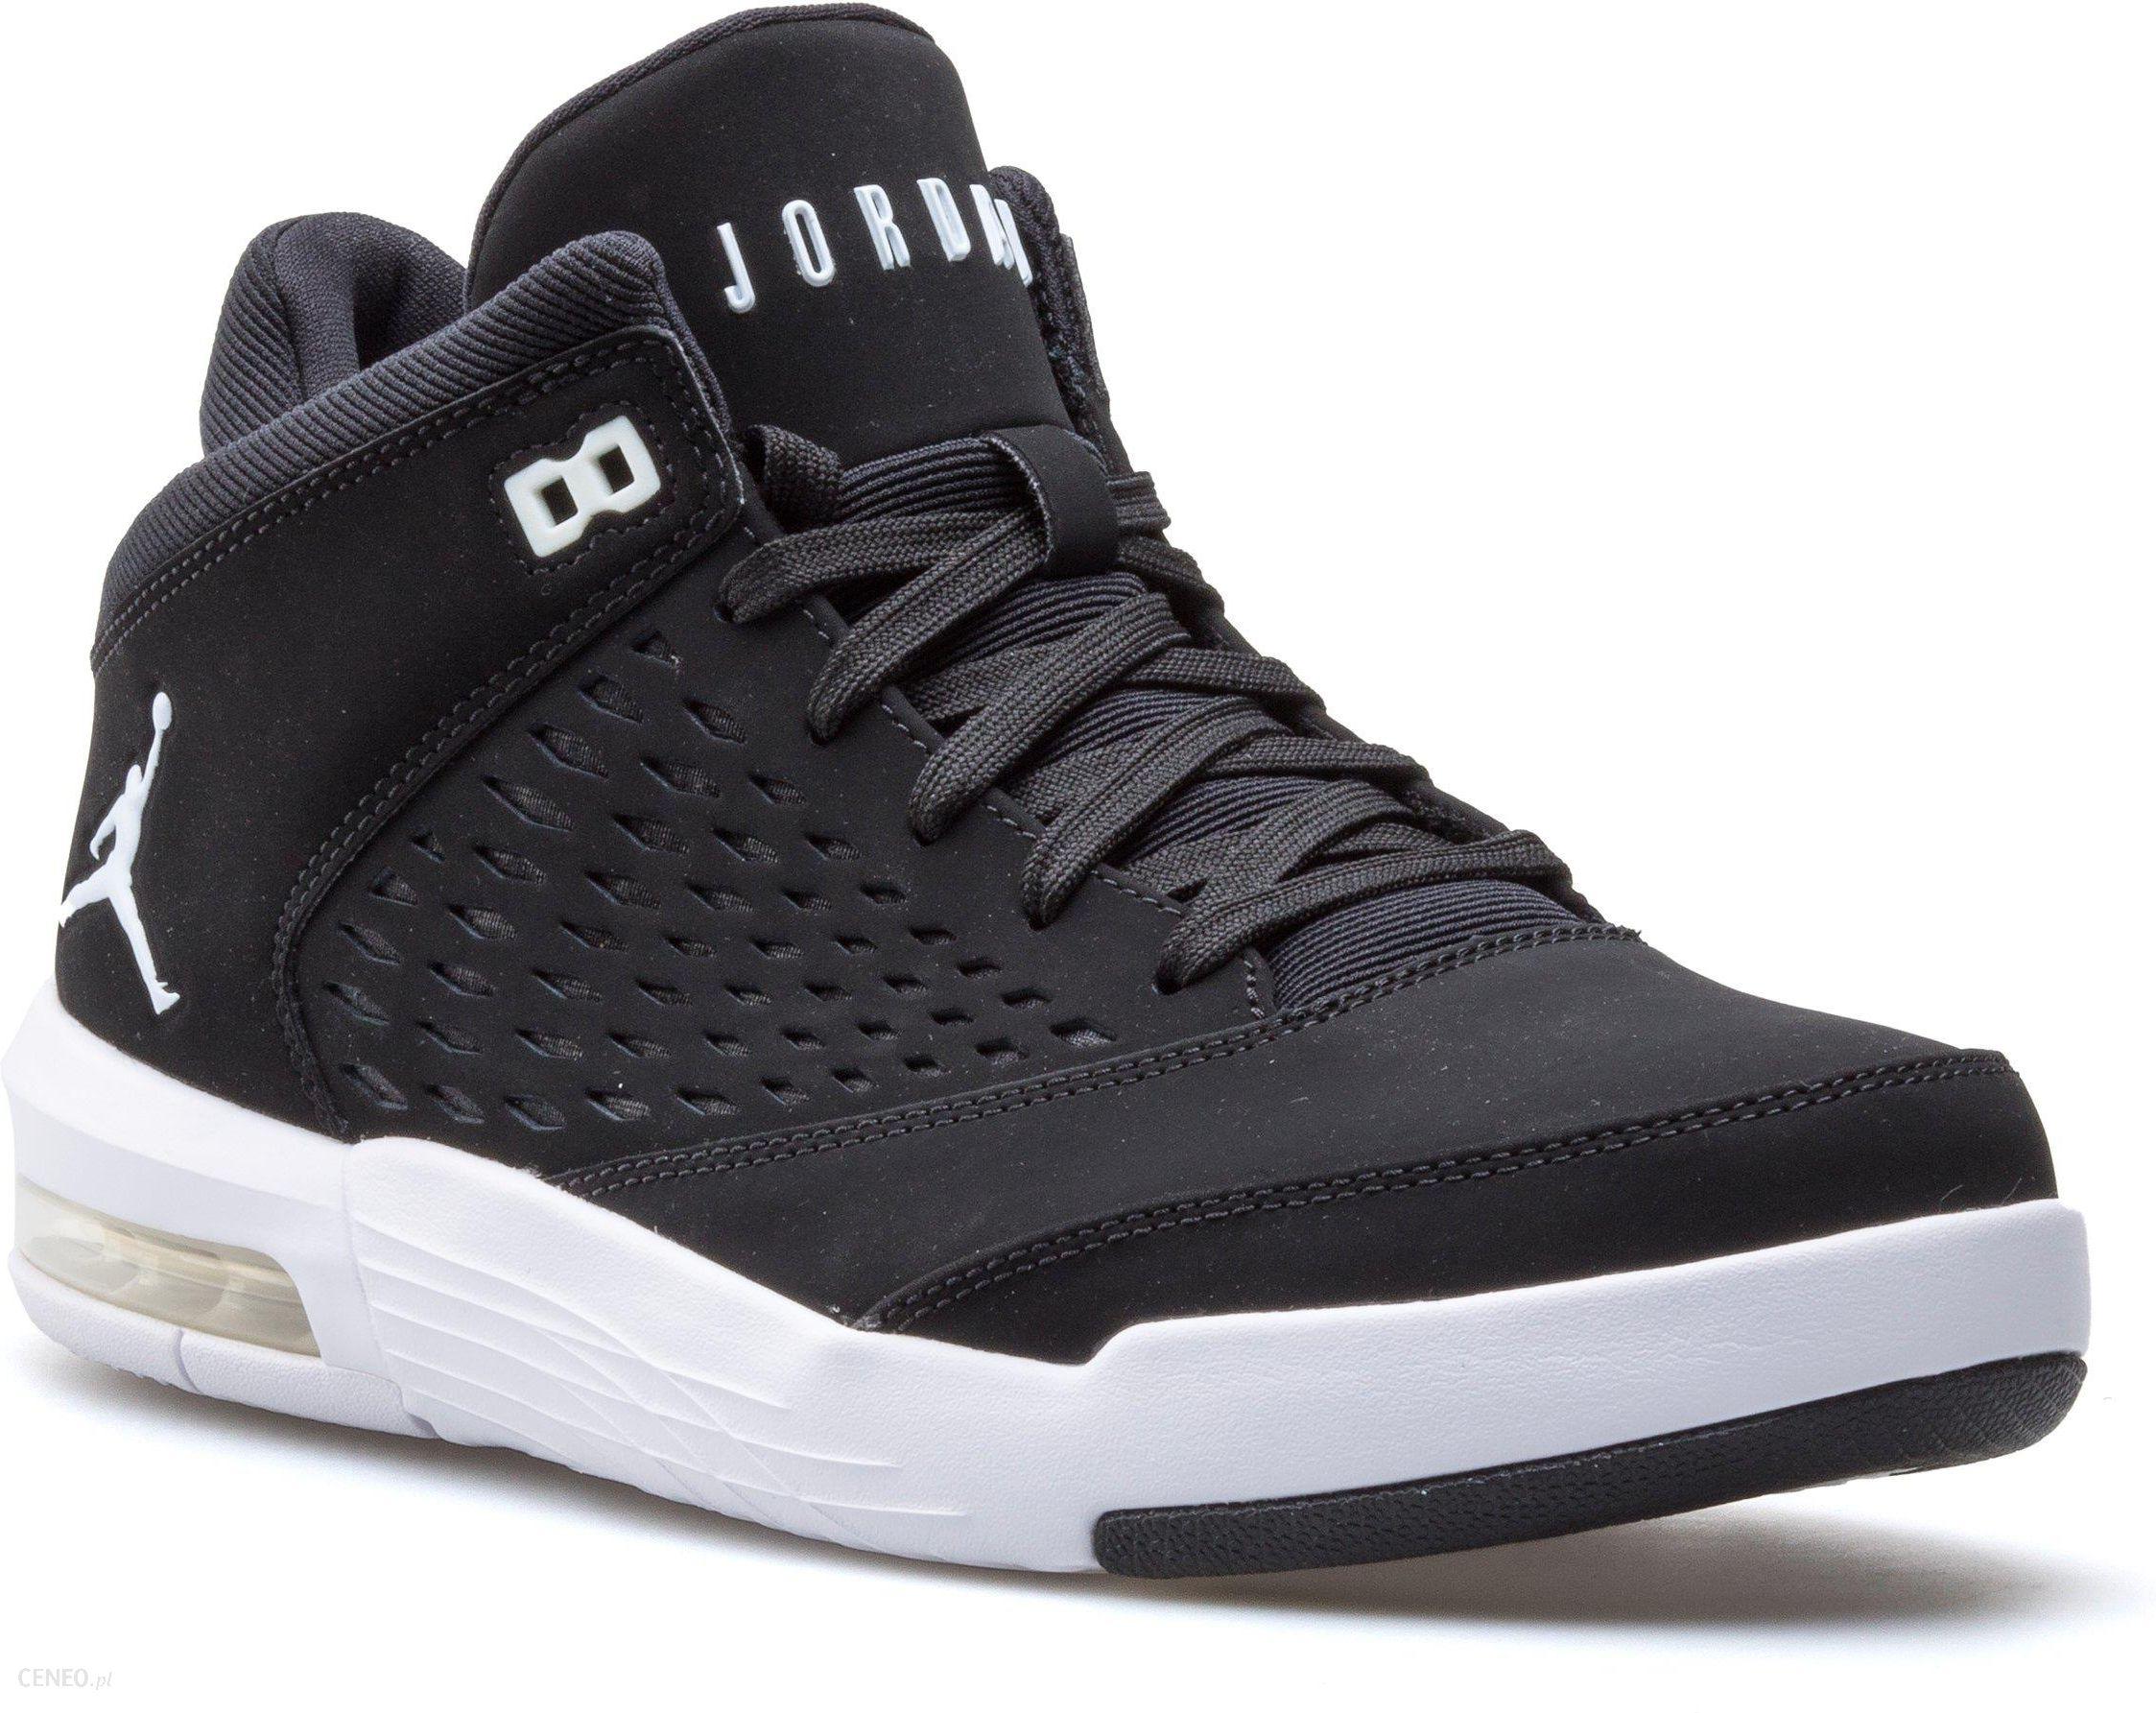 new product 07636 fbe3a Buty Nike Jordan Flight Origin 921196-001 r. 44,5 - Ceny i opinie ...